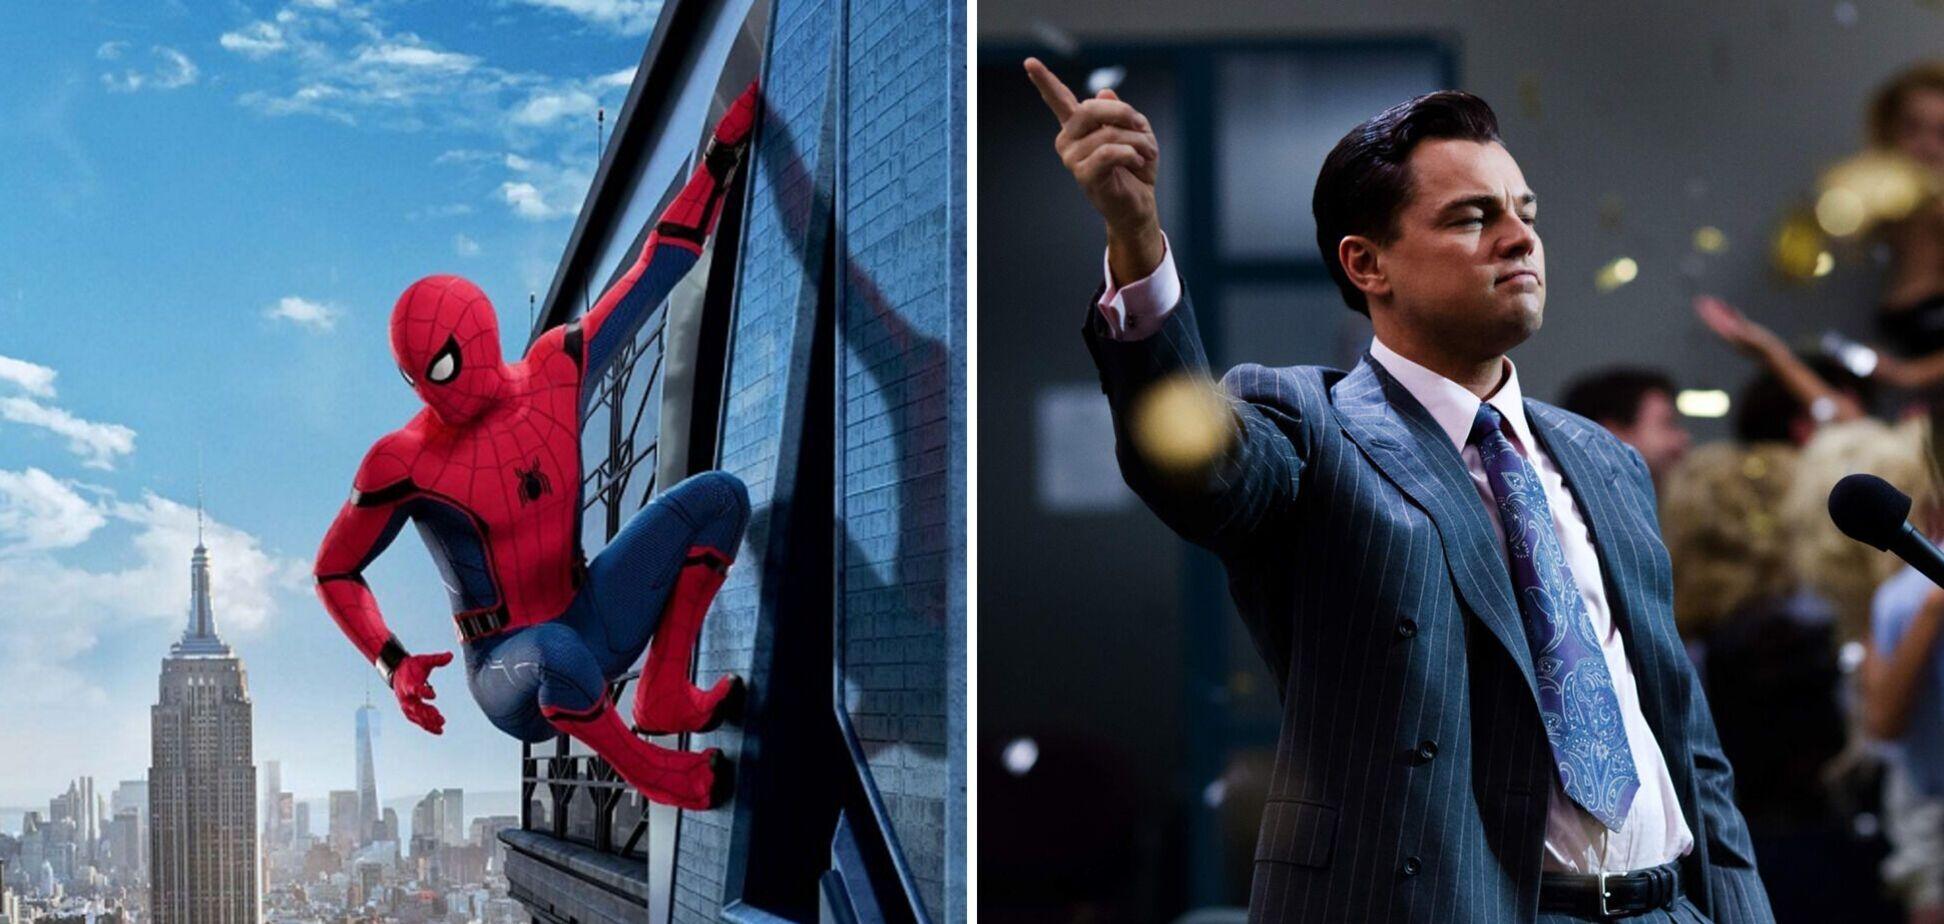 Людина-павук, Джокер та інші герої найбільше запам'яталися глядачам